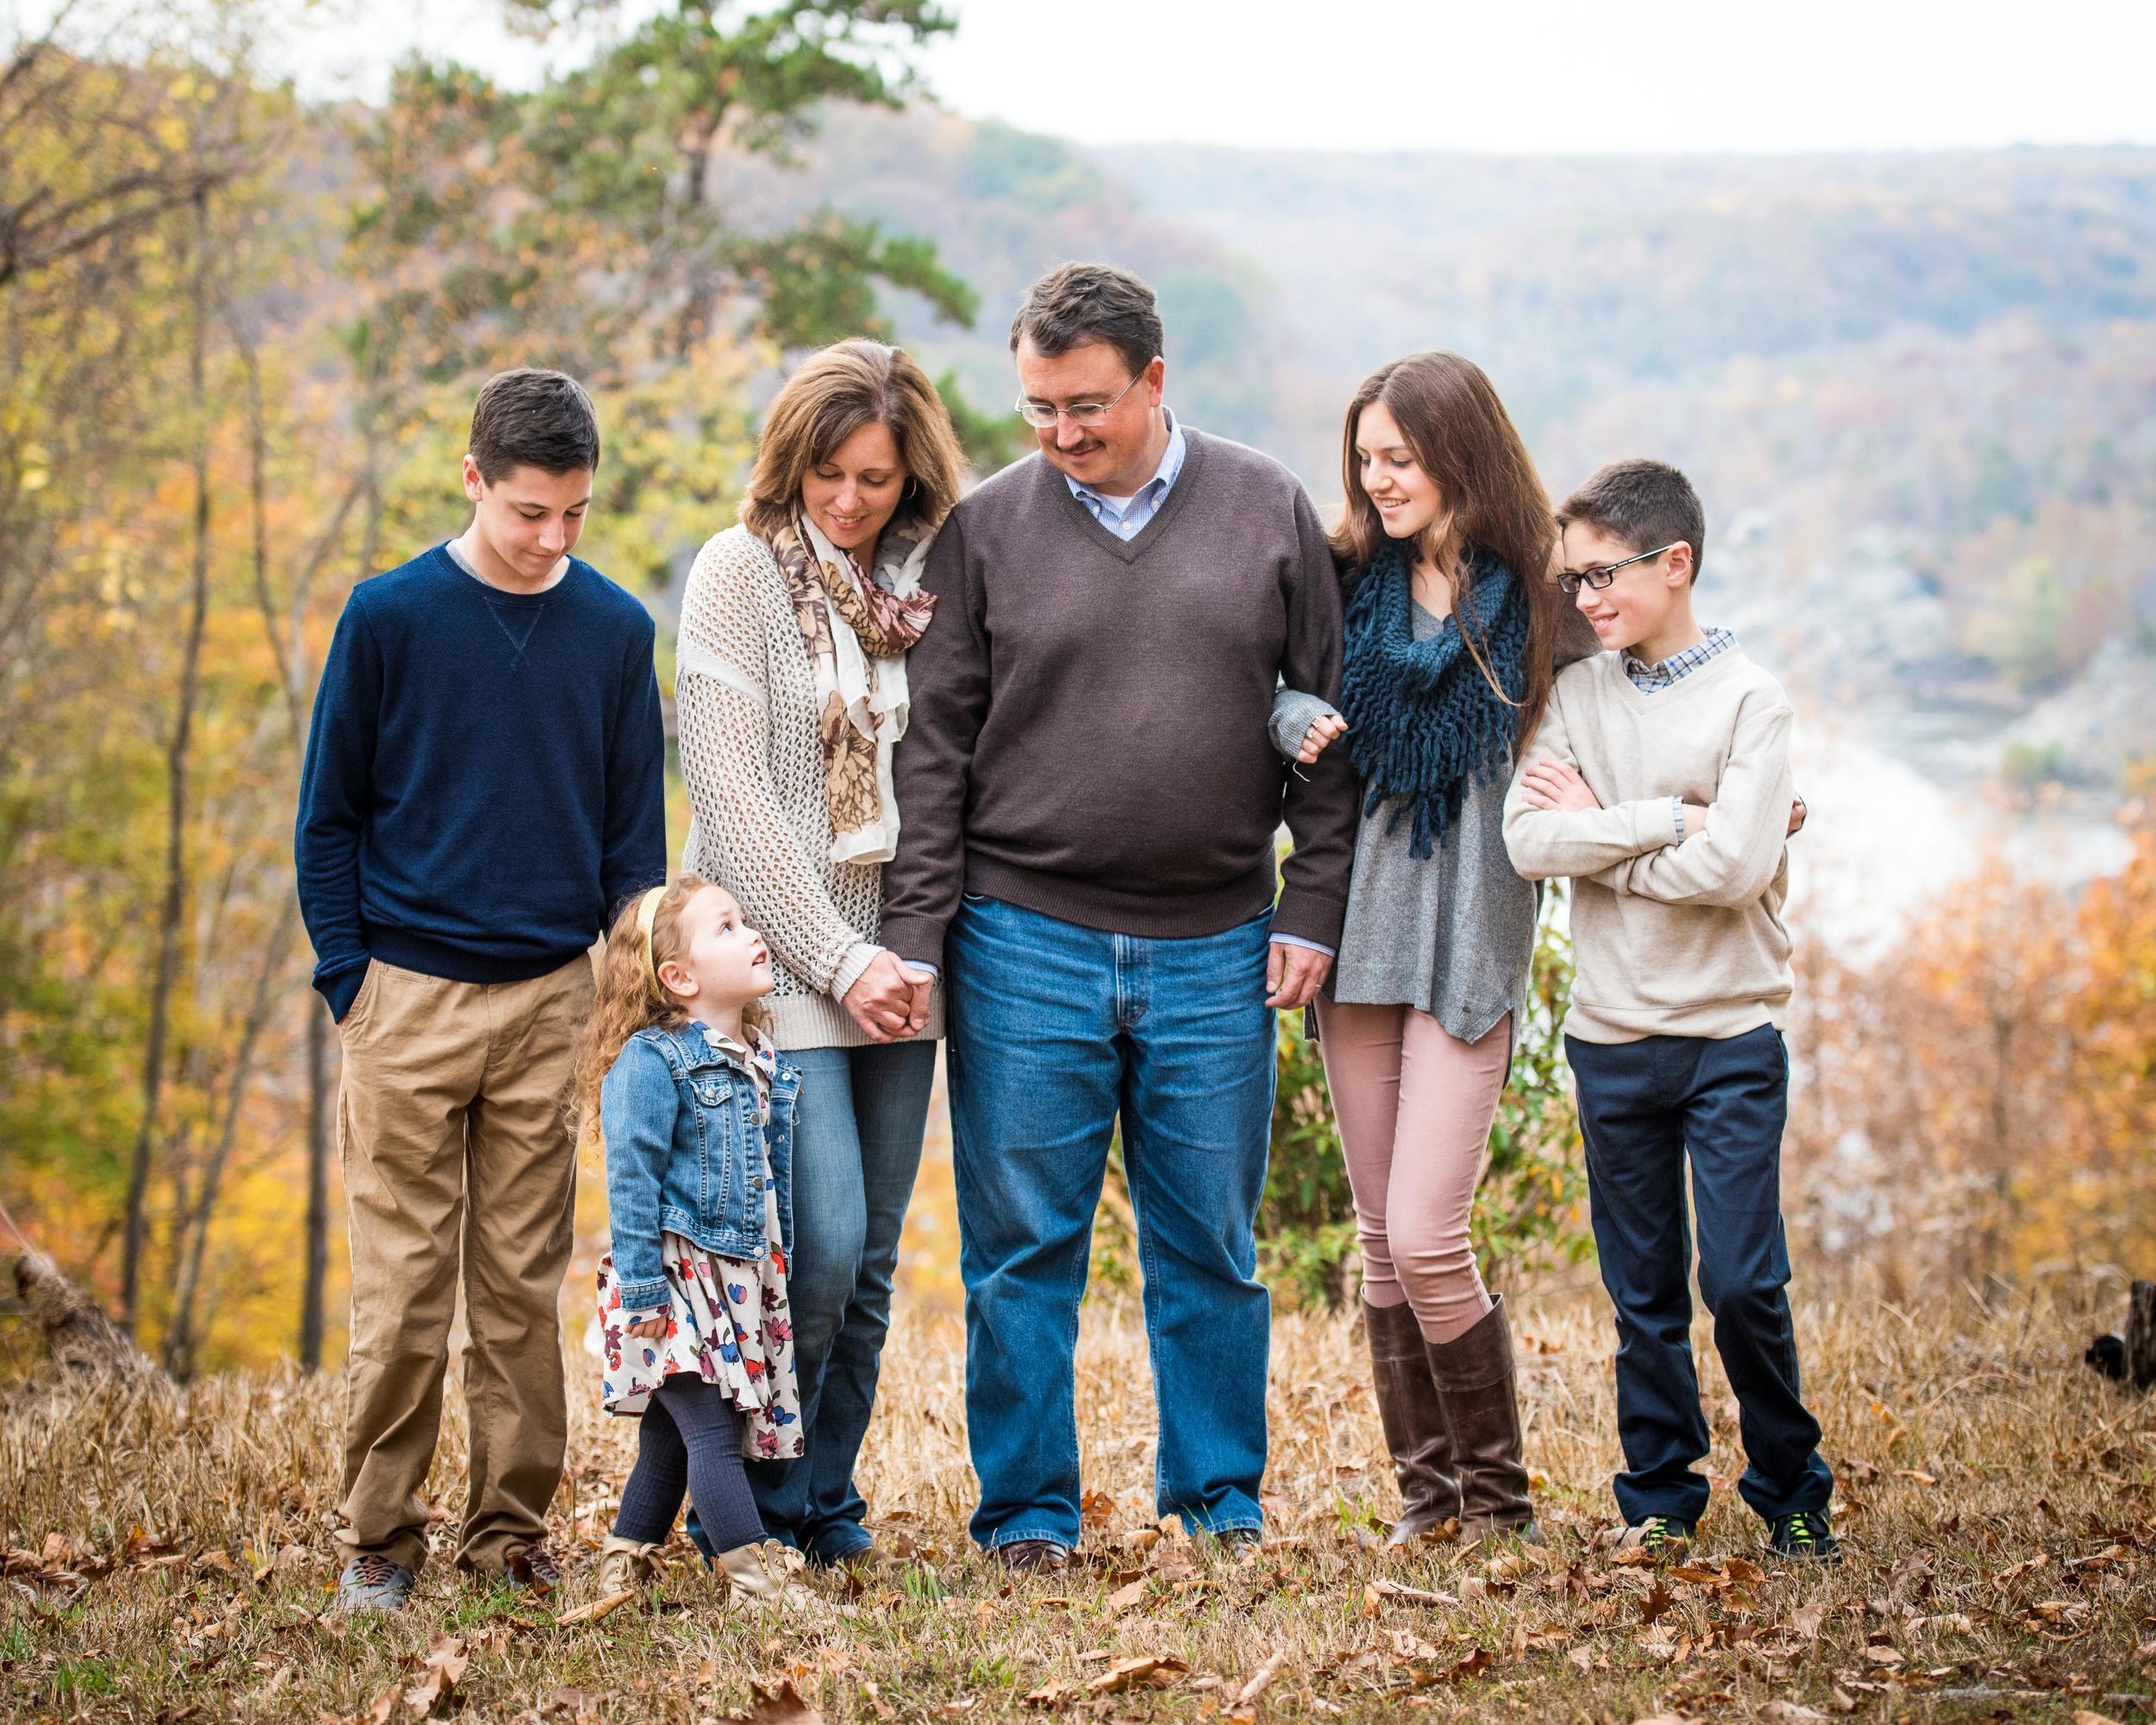 Family Photographer McLean Photographer